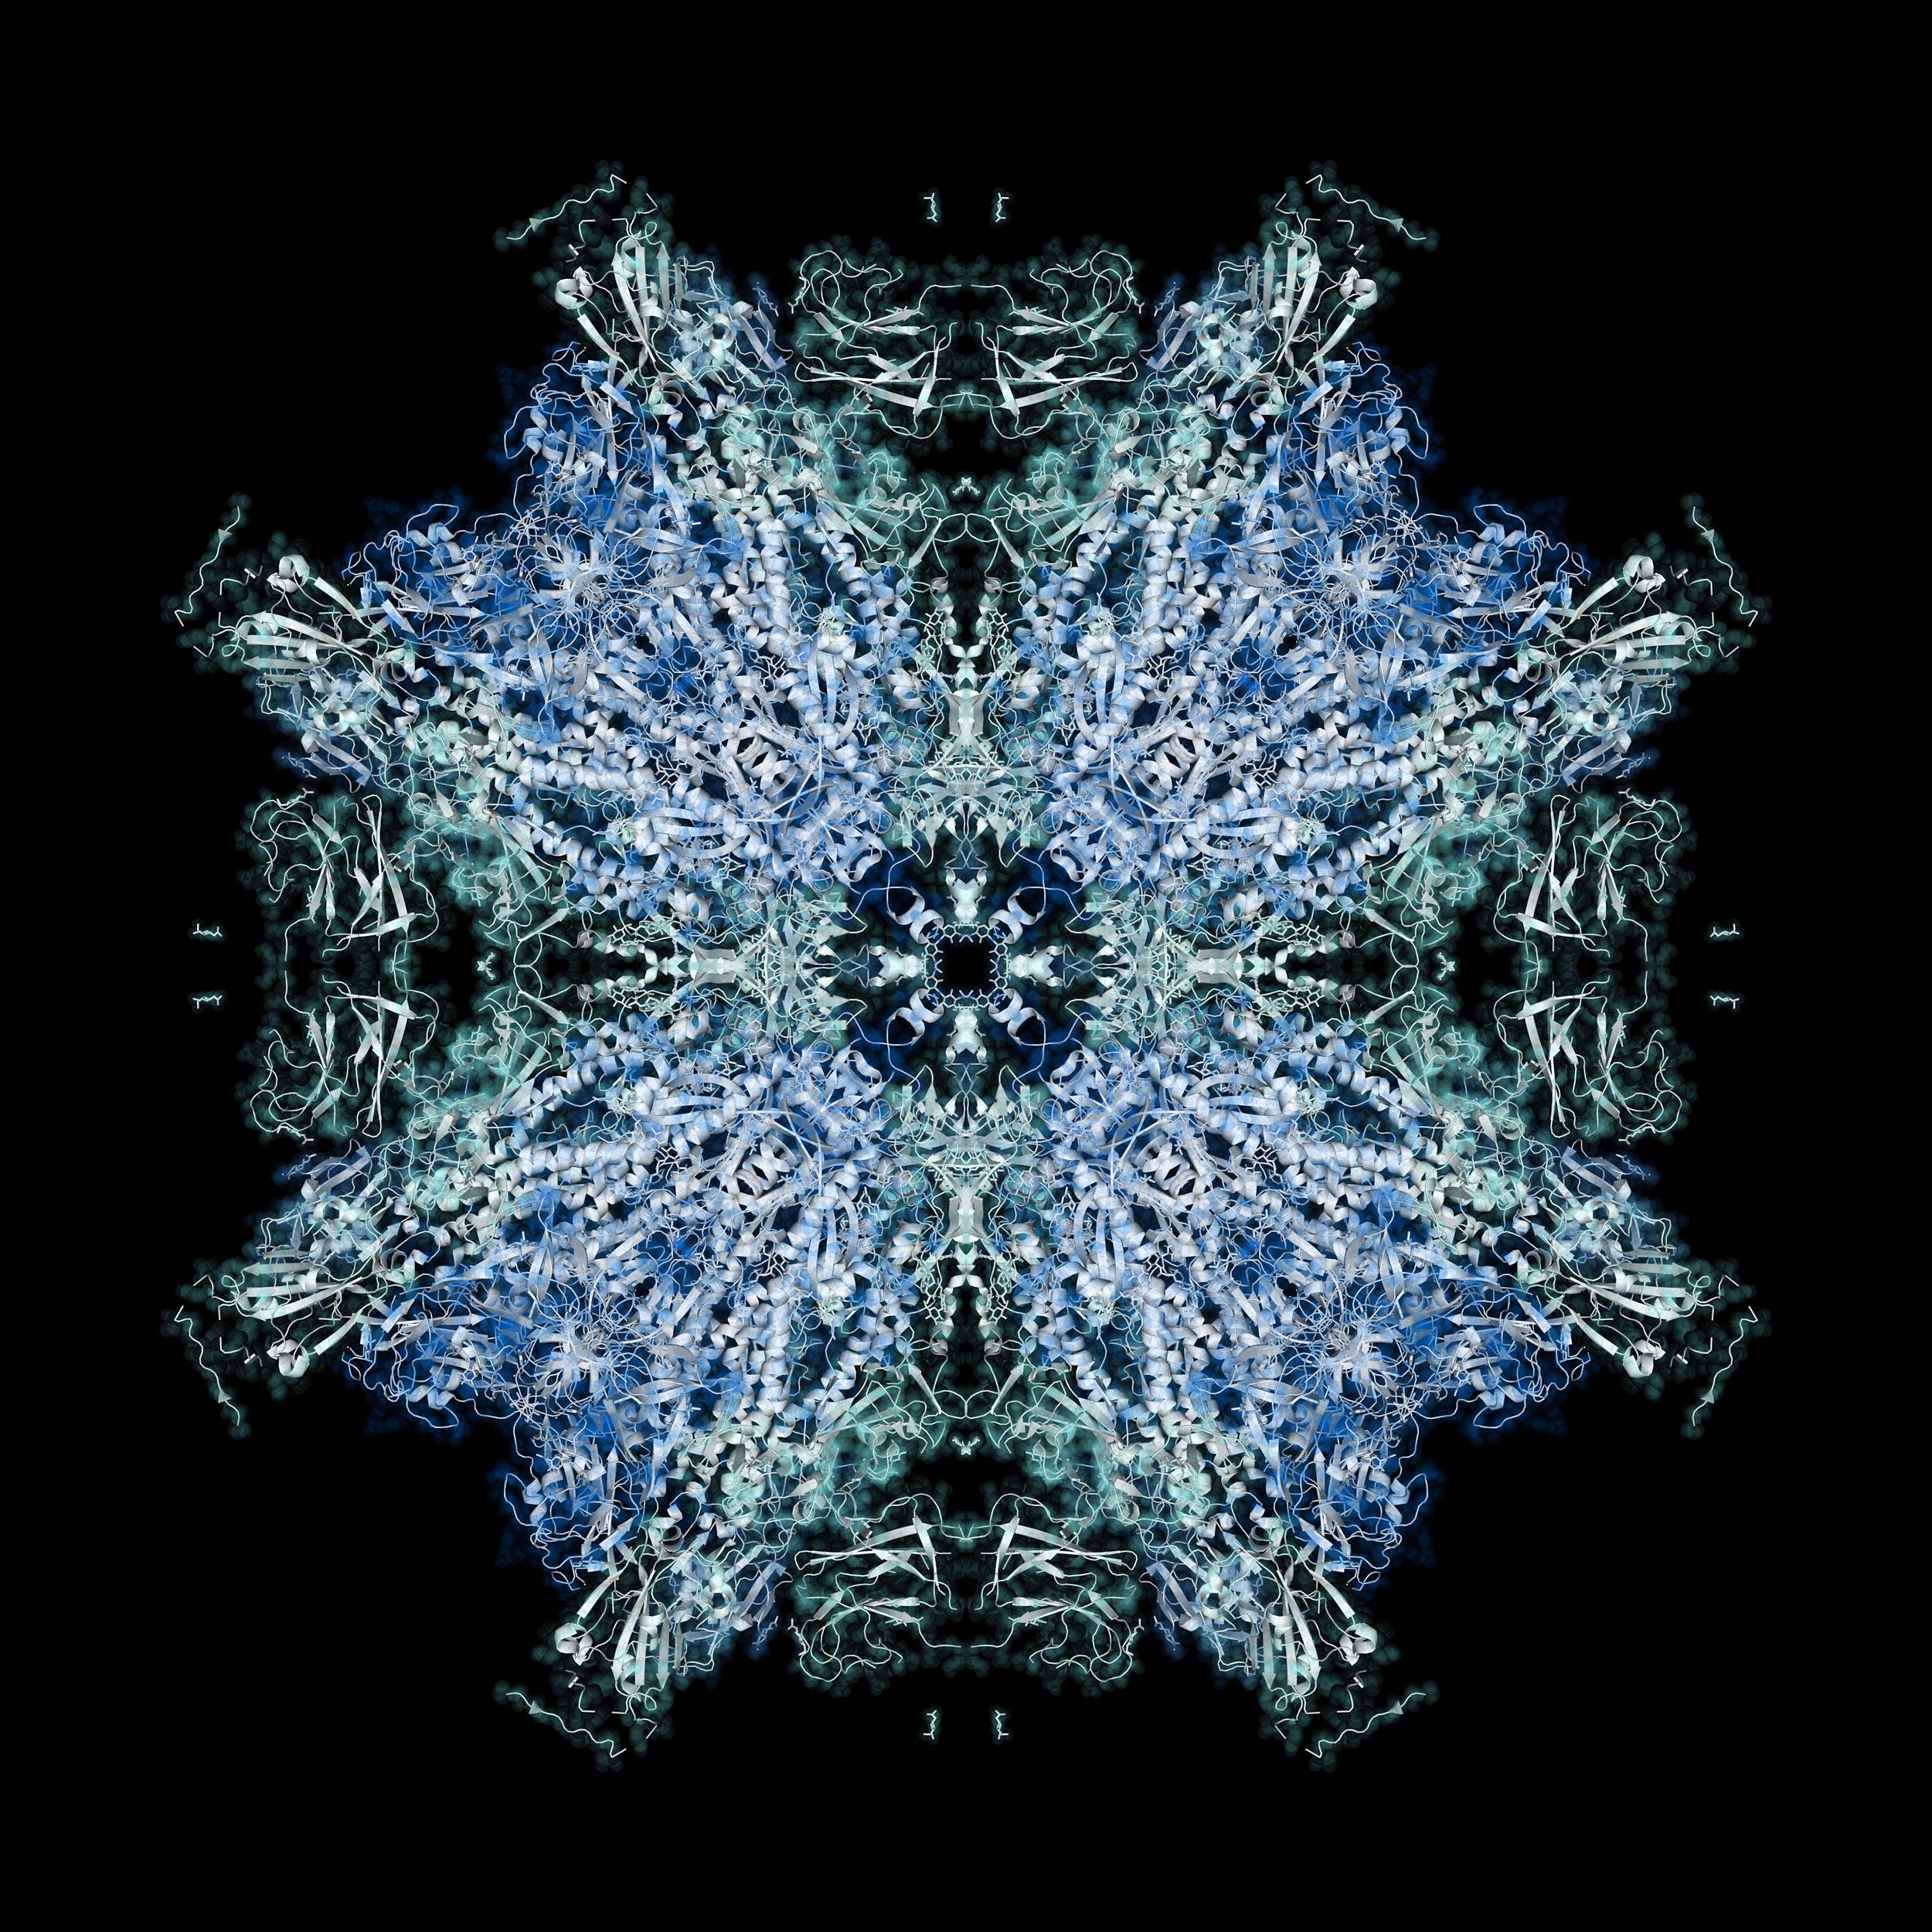 2-marine-aquamarine-skyblue-1-11-26